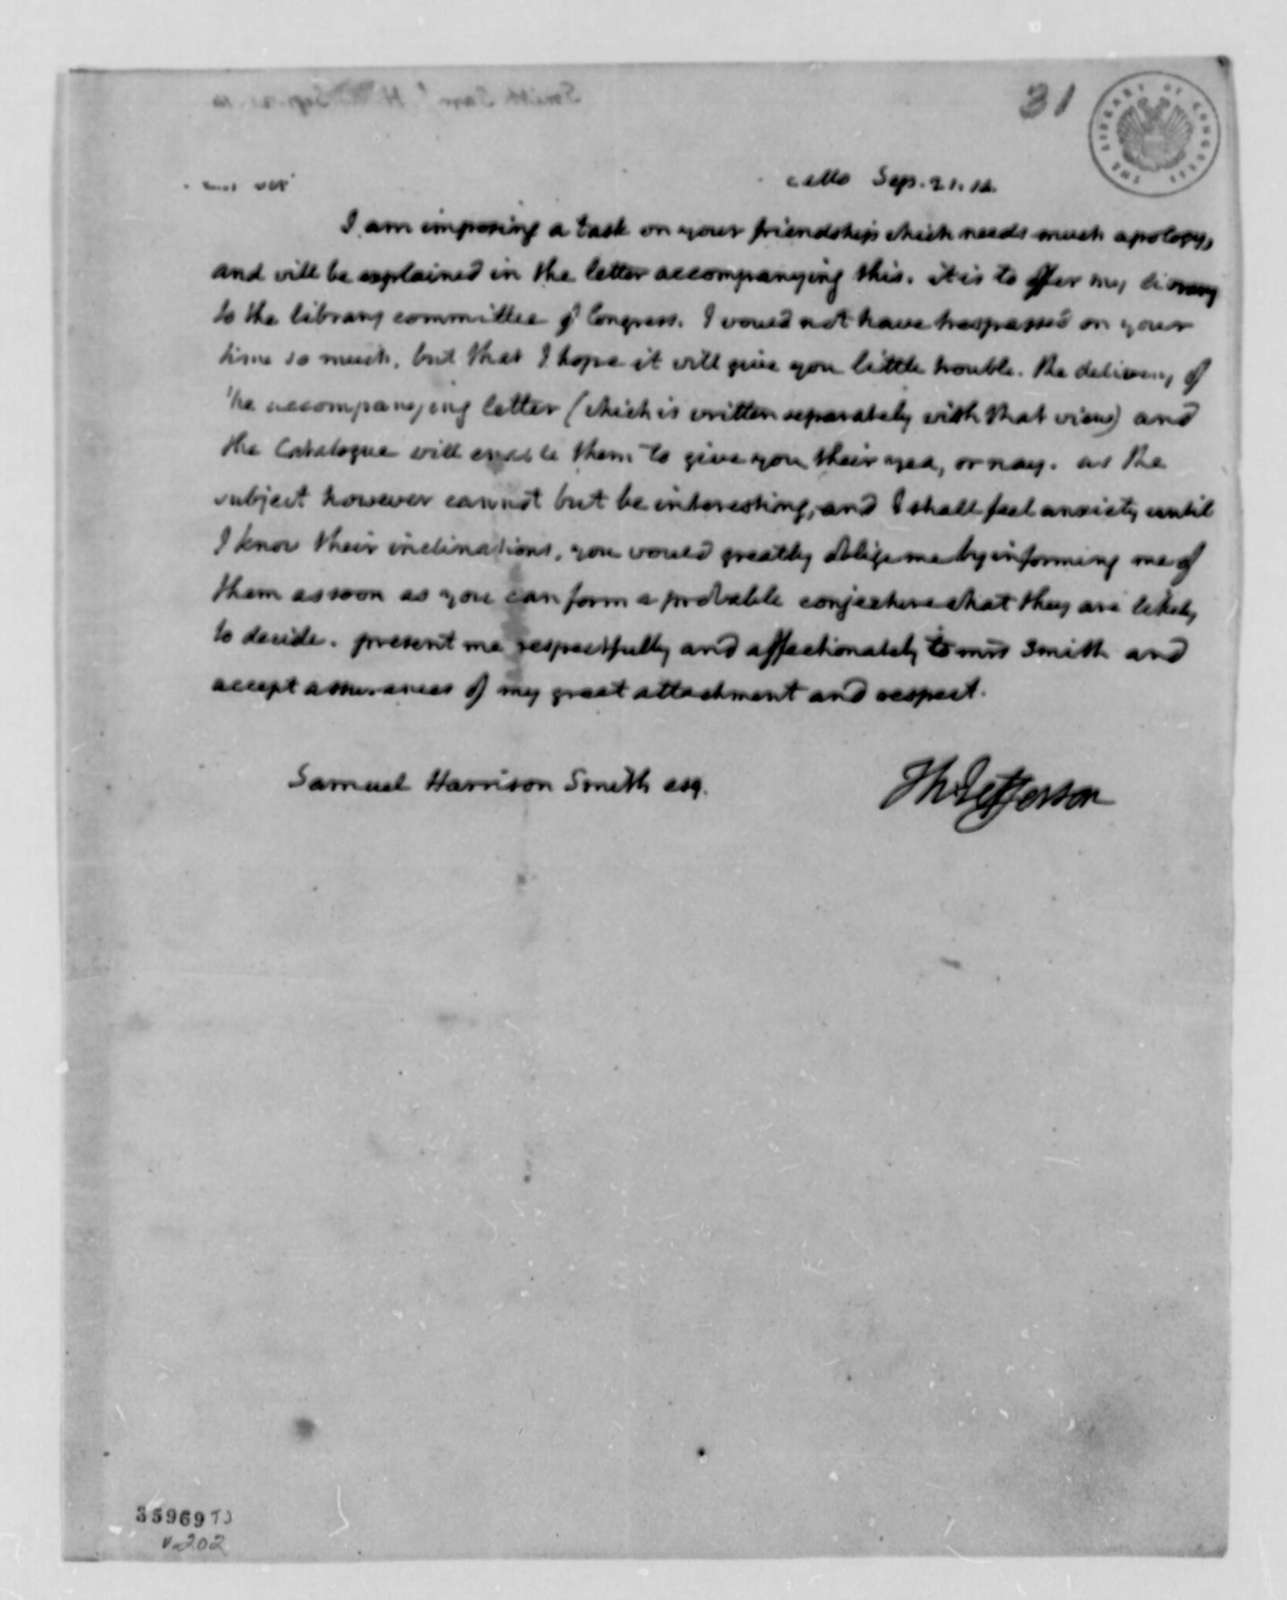 Thomas Jefferson to Samuel H. Smith, September 21, 1814